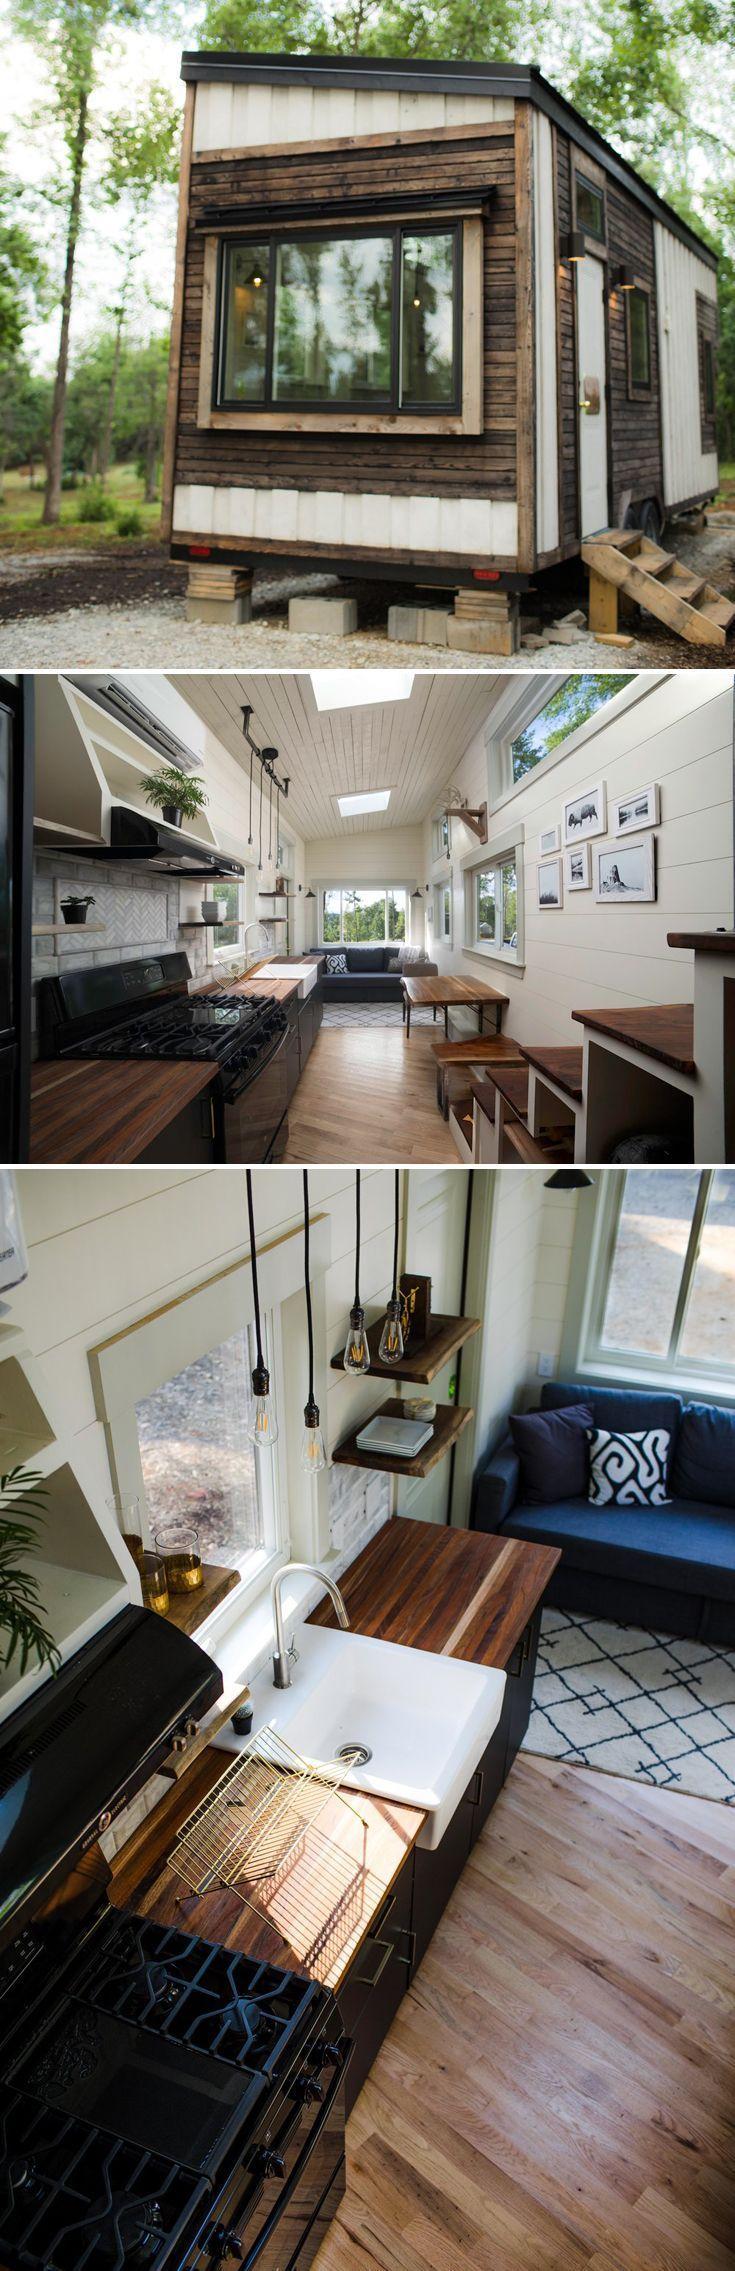 Best 25+ Outside lights on house ideas on Pinterest   Super lotto ...